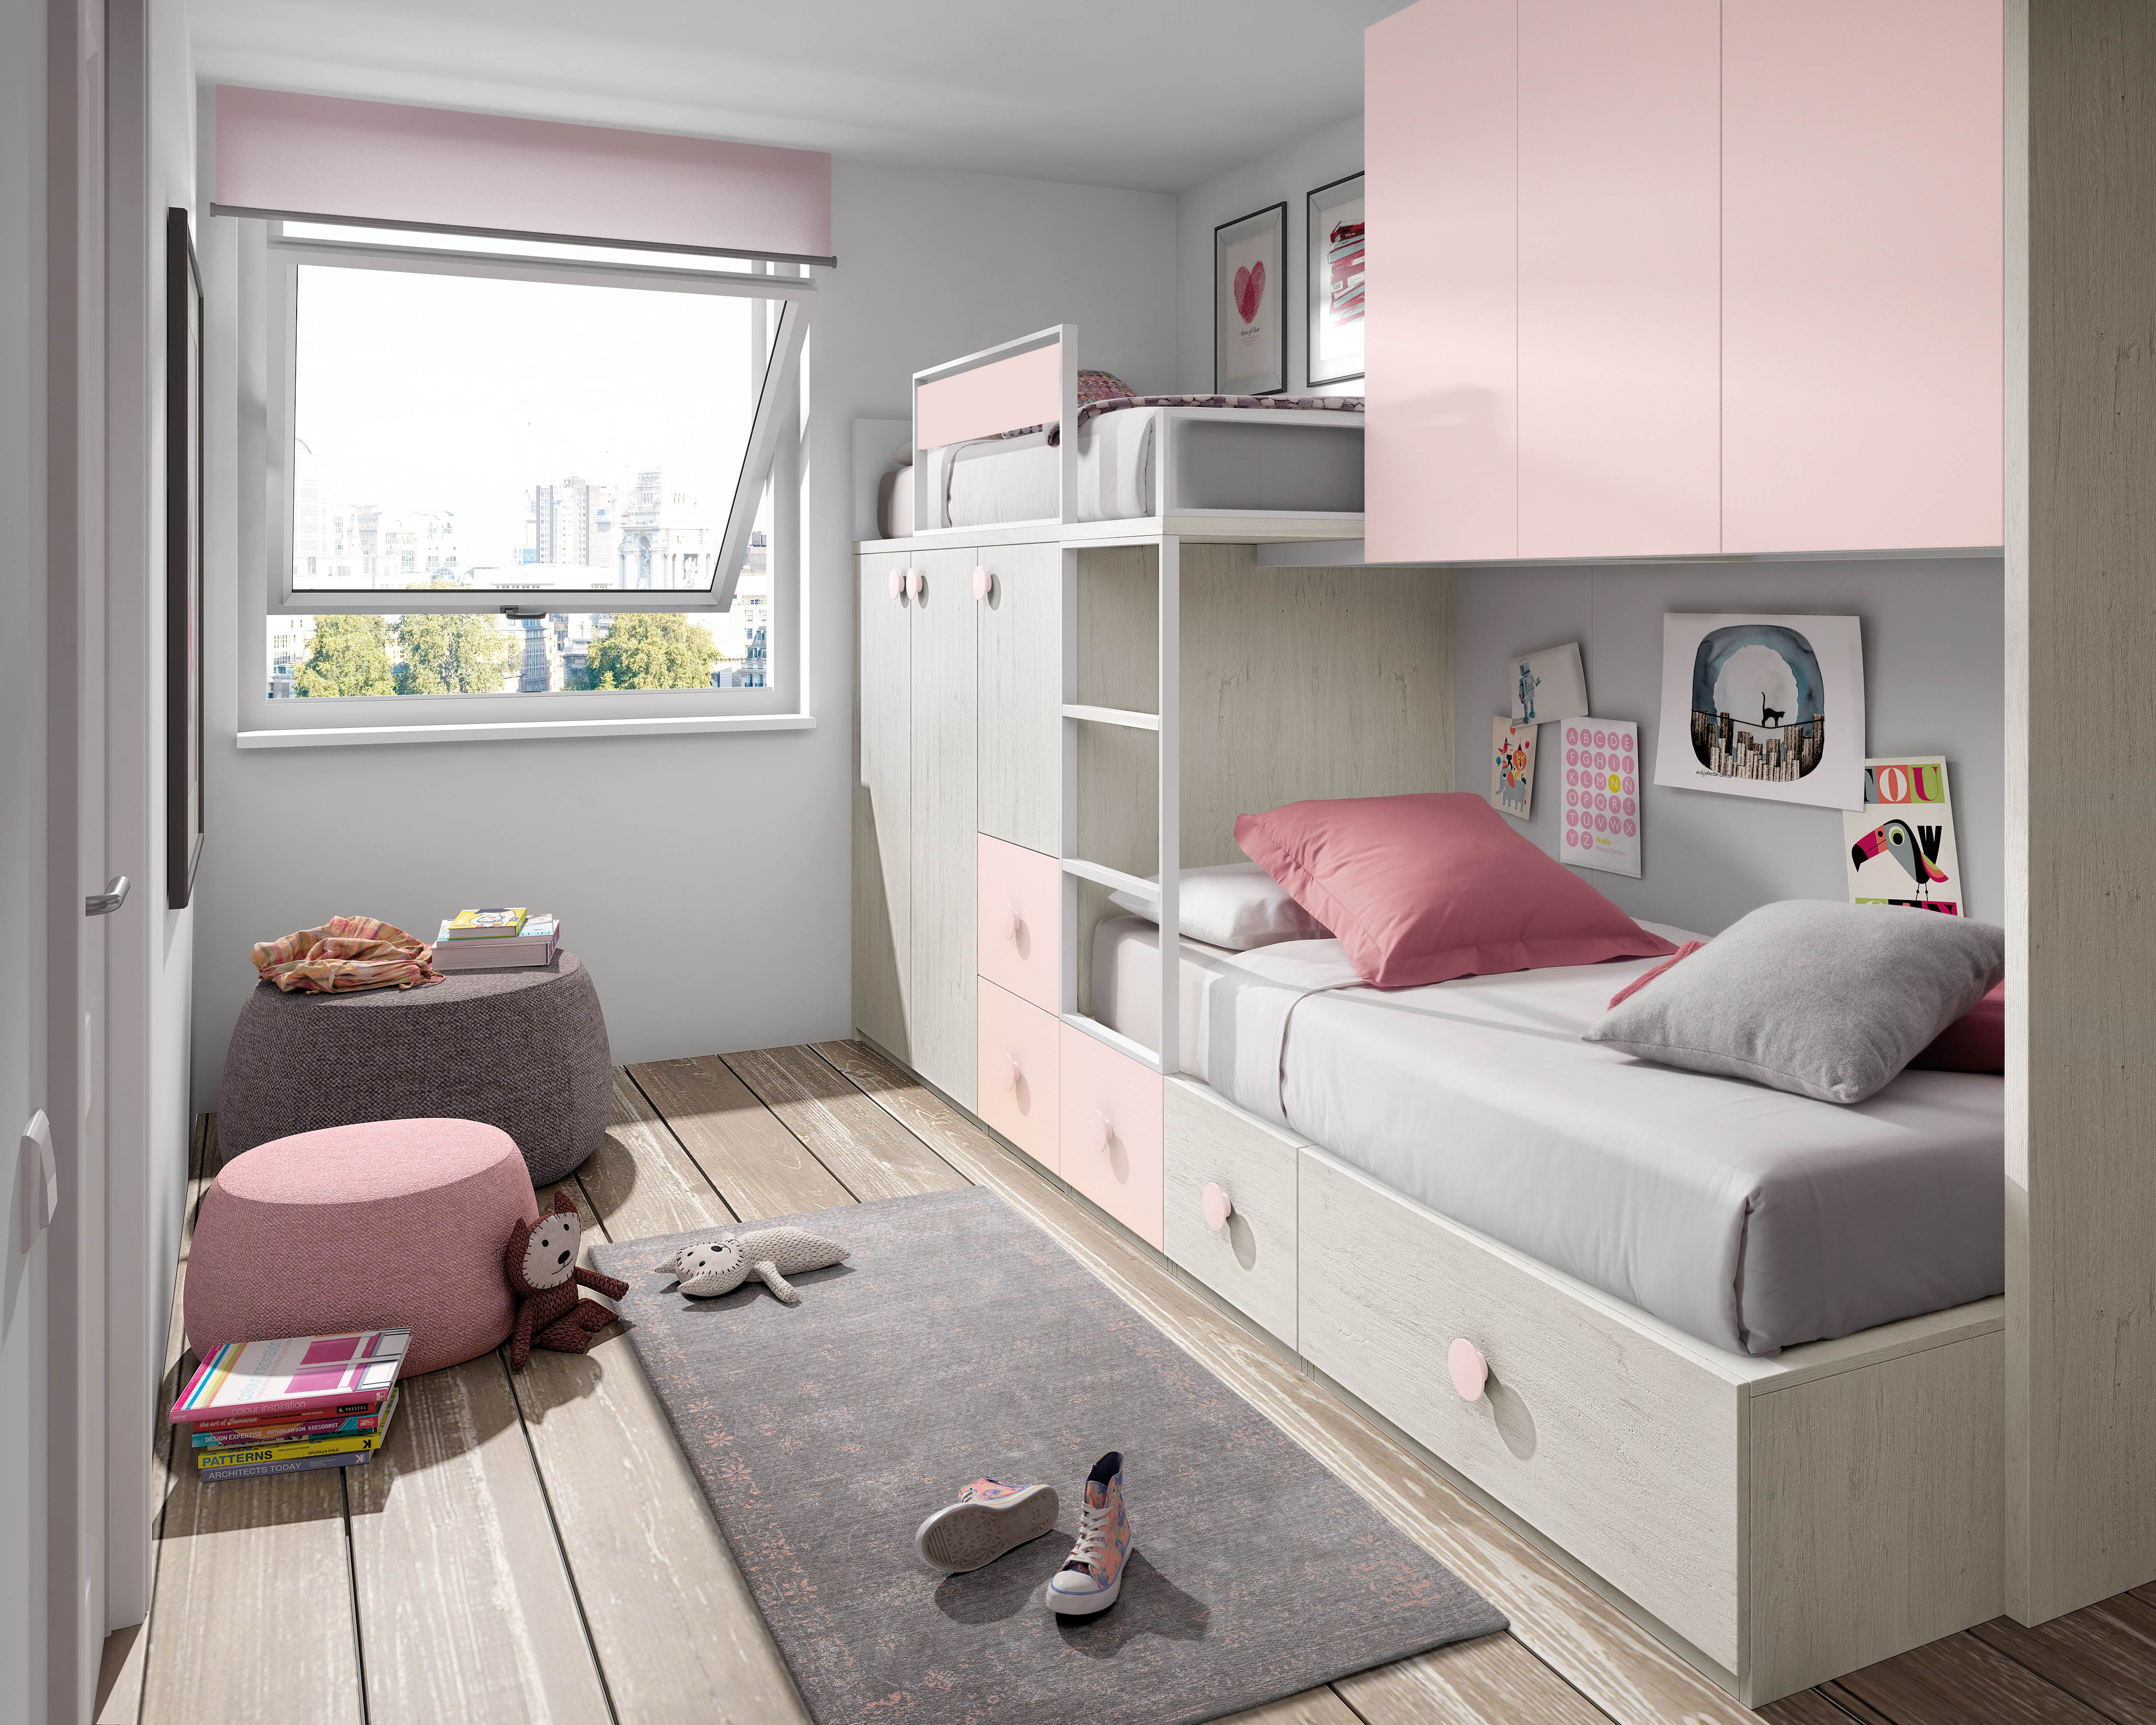 Muebles juveniles cama tren dormitorios juveniles cama - Cama tren juvenil ...